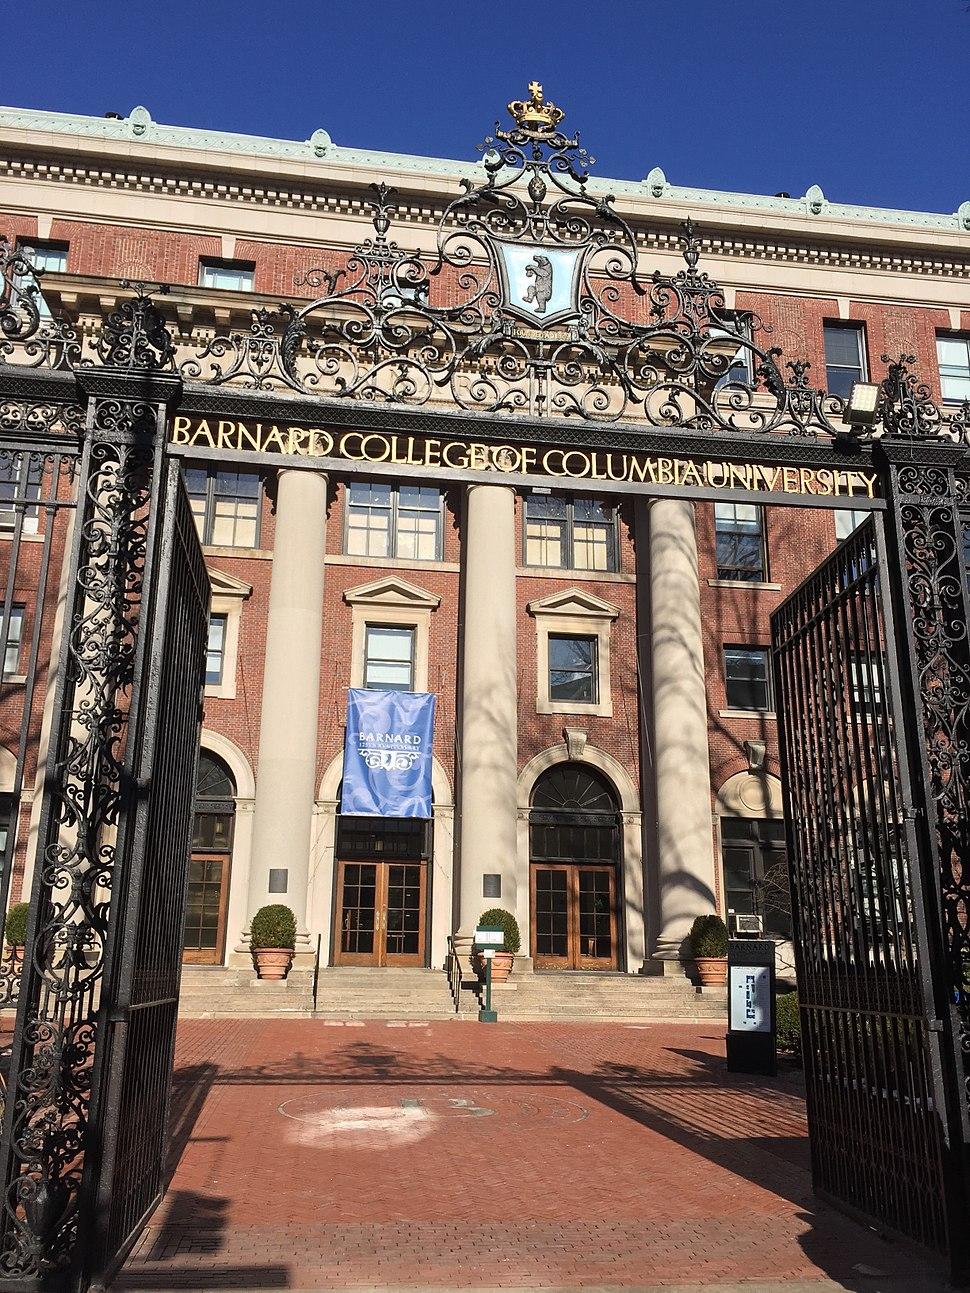 WikiDay 2015 - Barnard College Gates 1.jpg